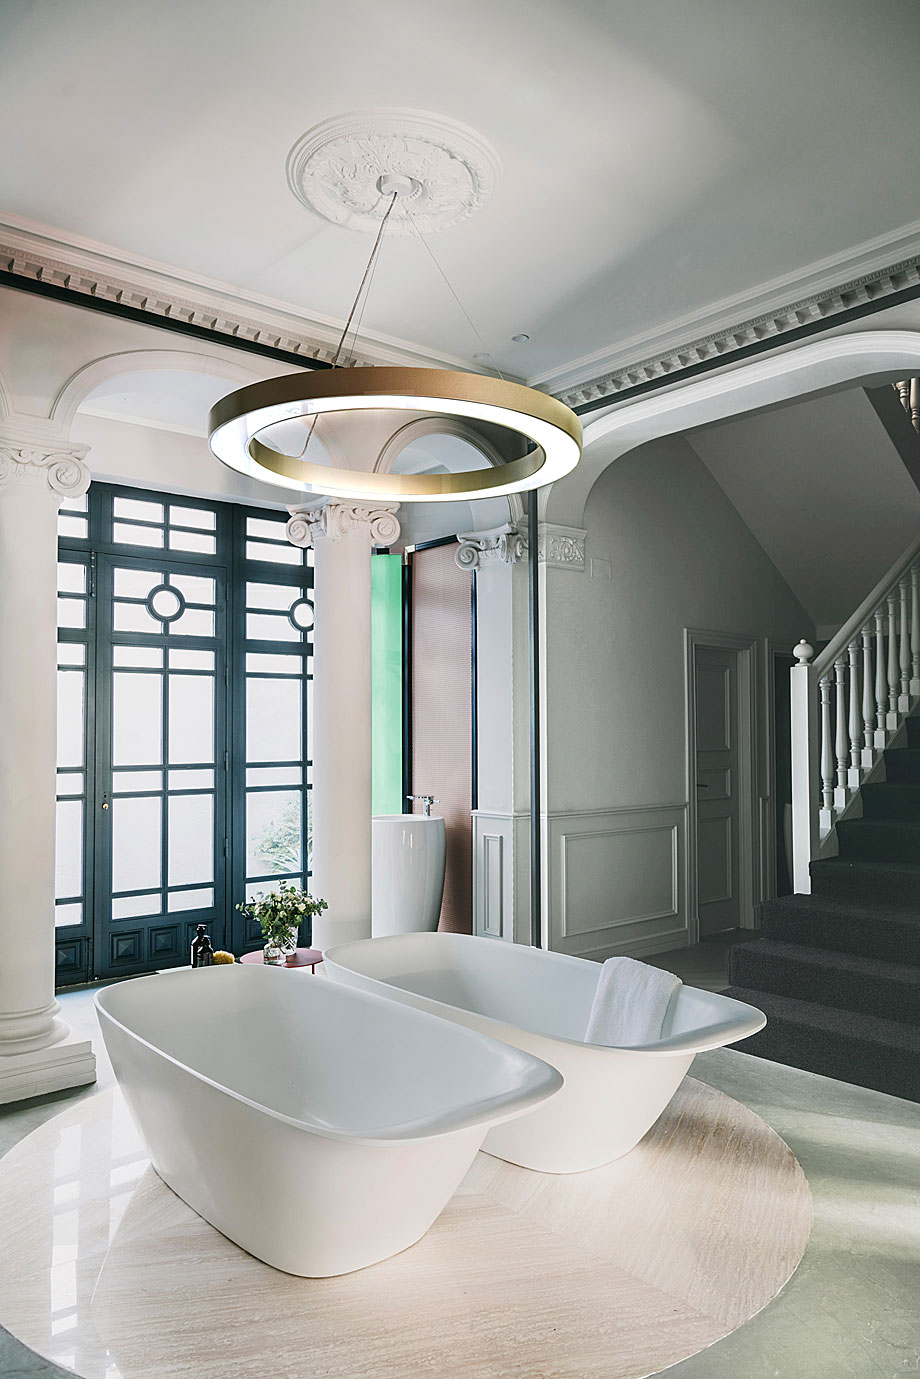 laufen-showroom-baños-madrid-patricia-urquiola (2)